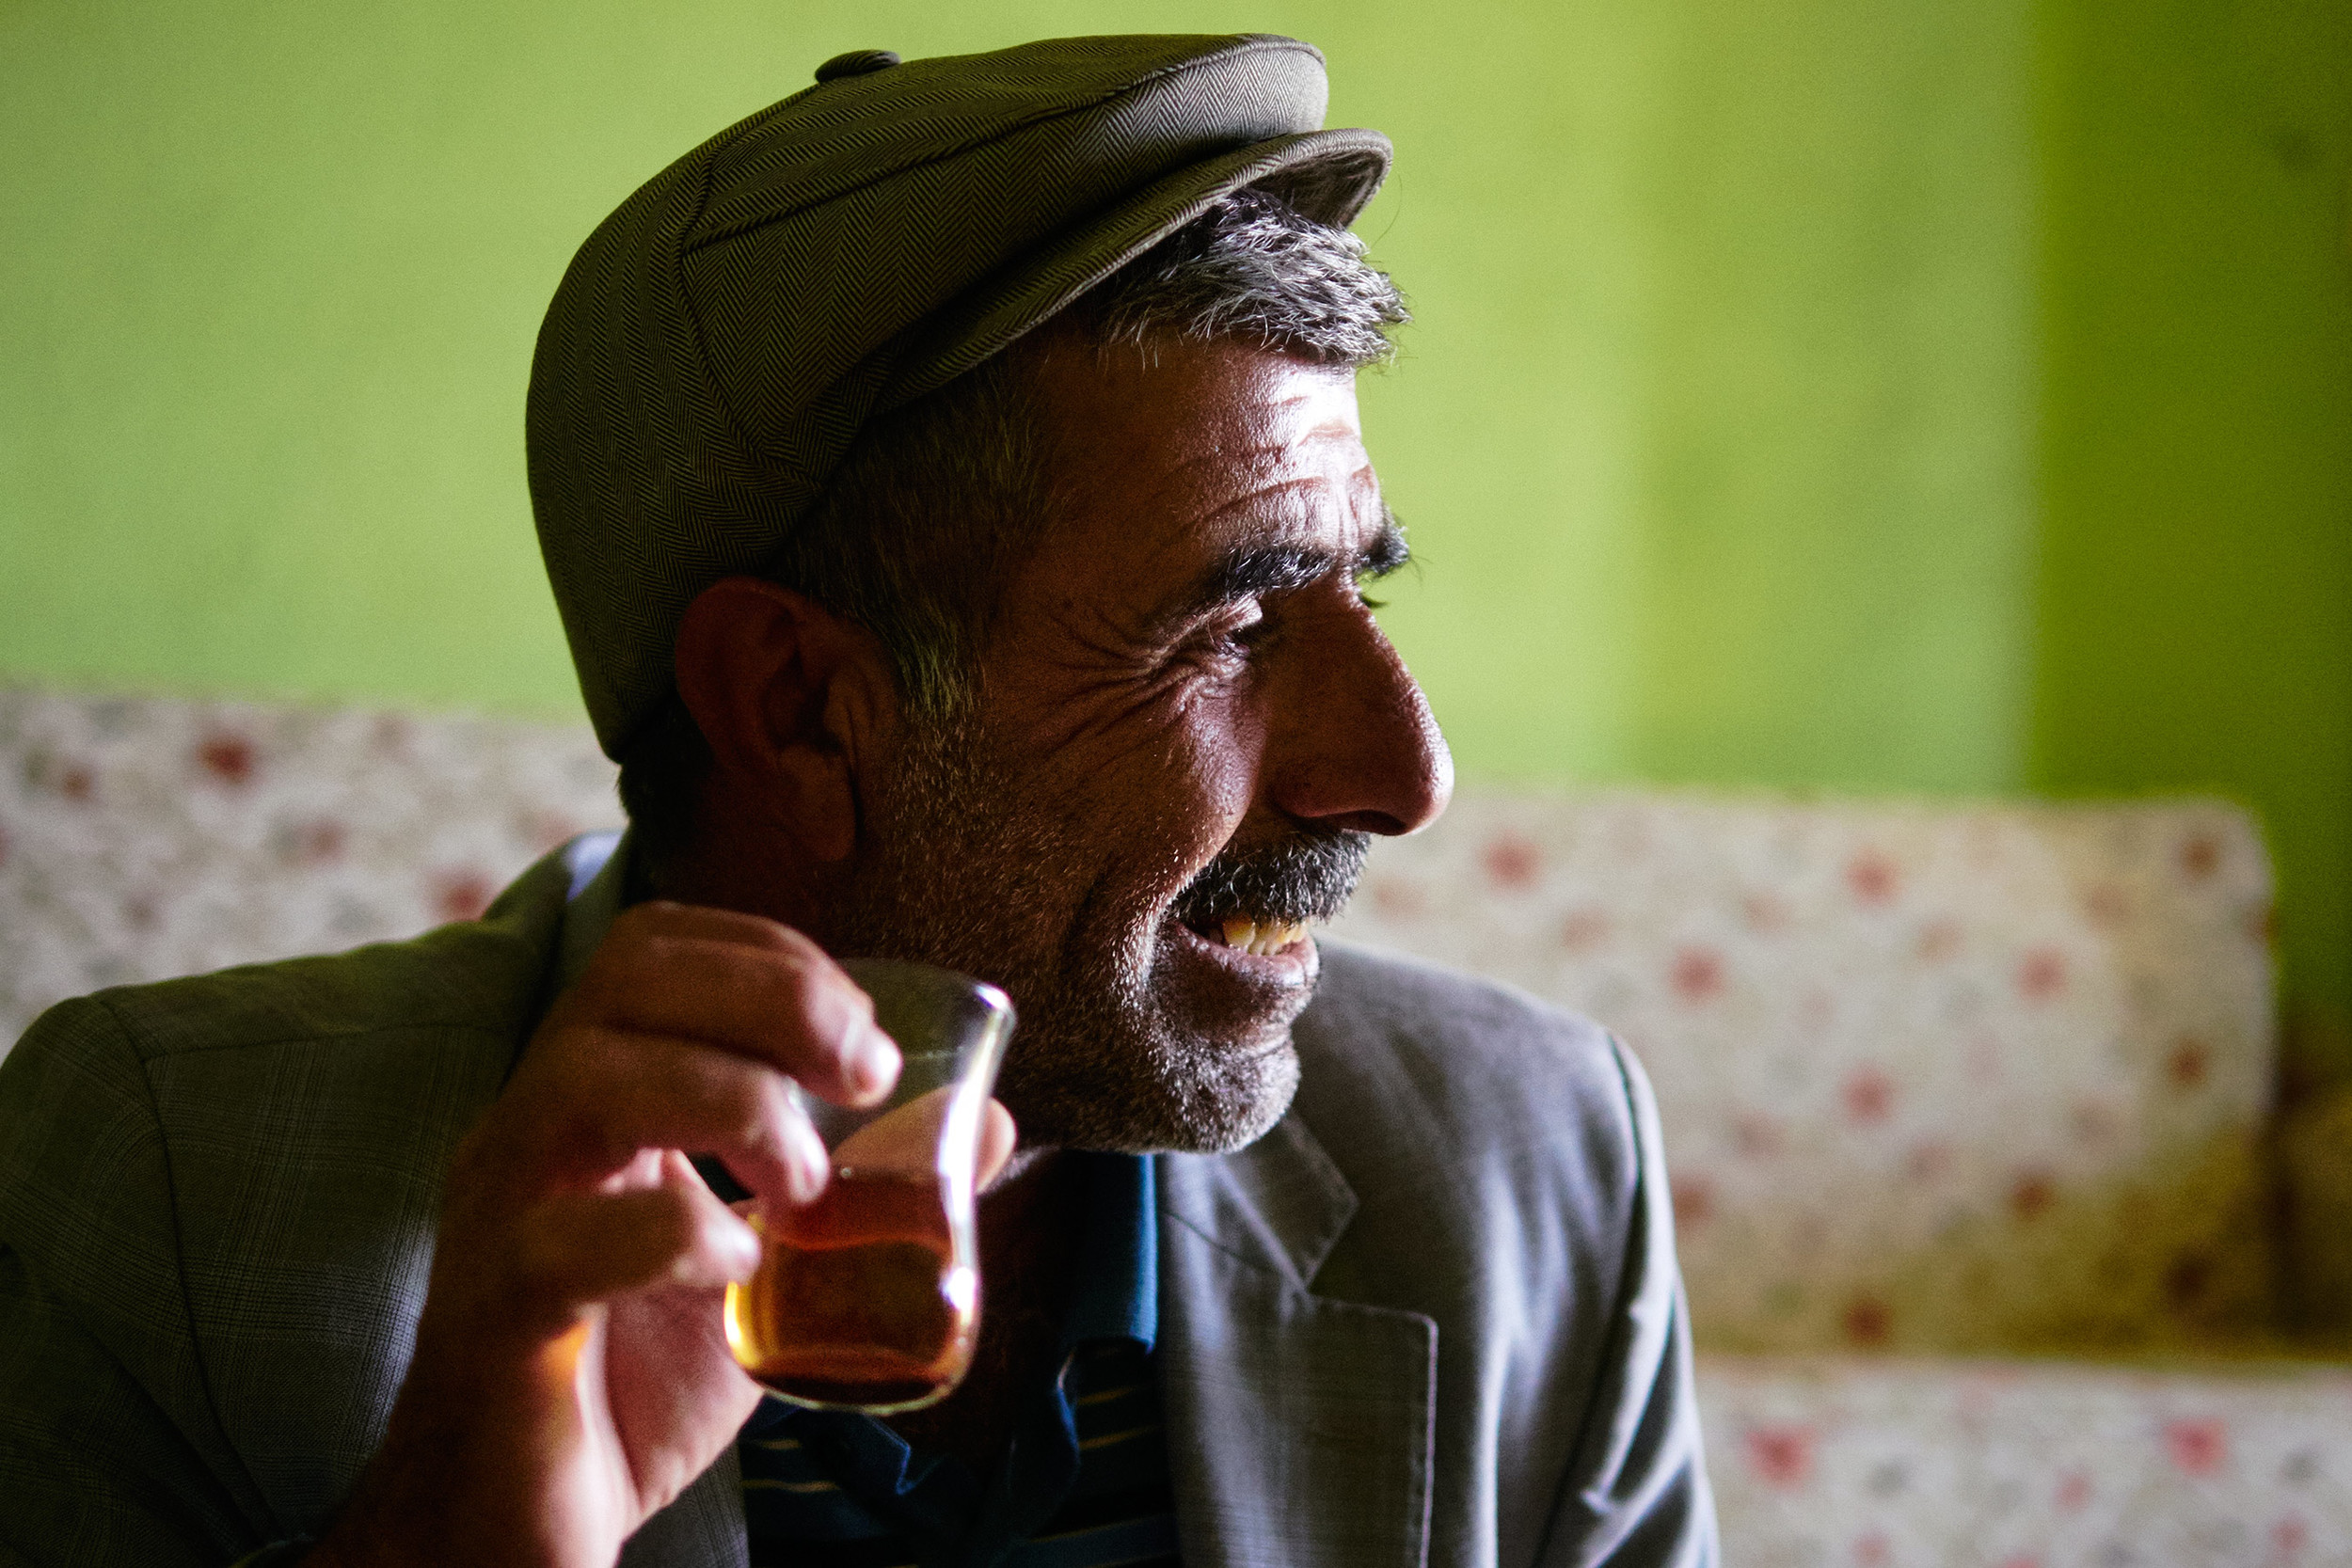 Mustafa having tea and smiling